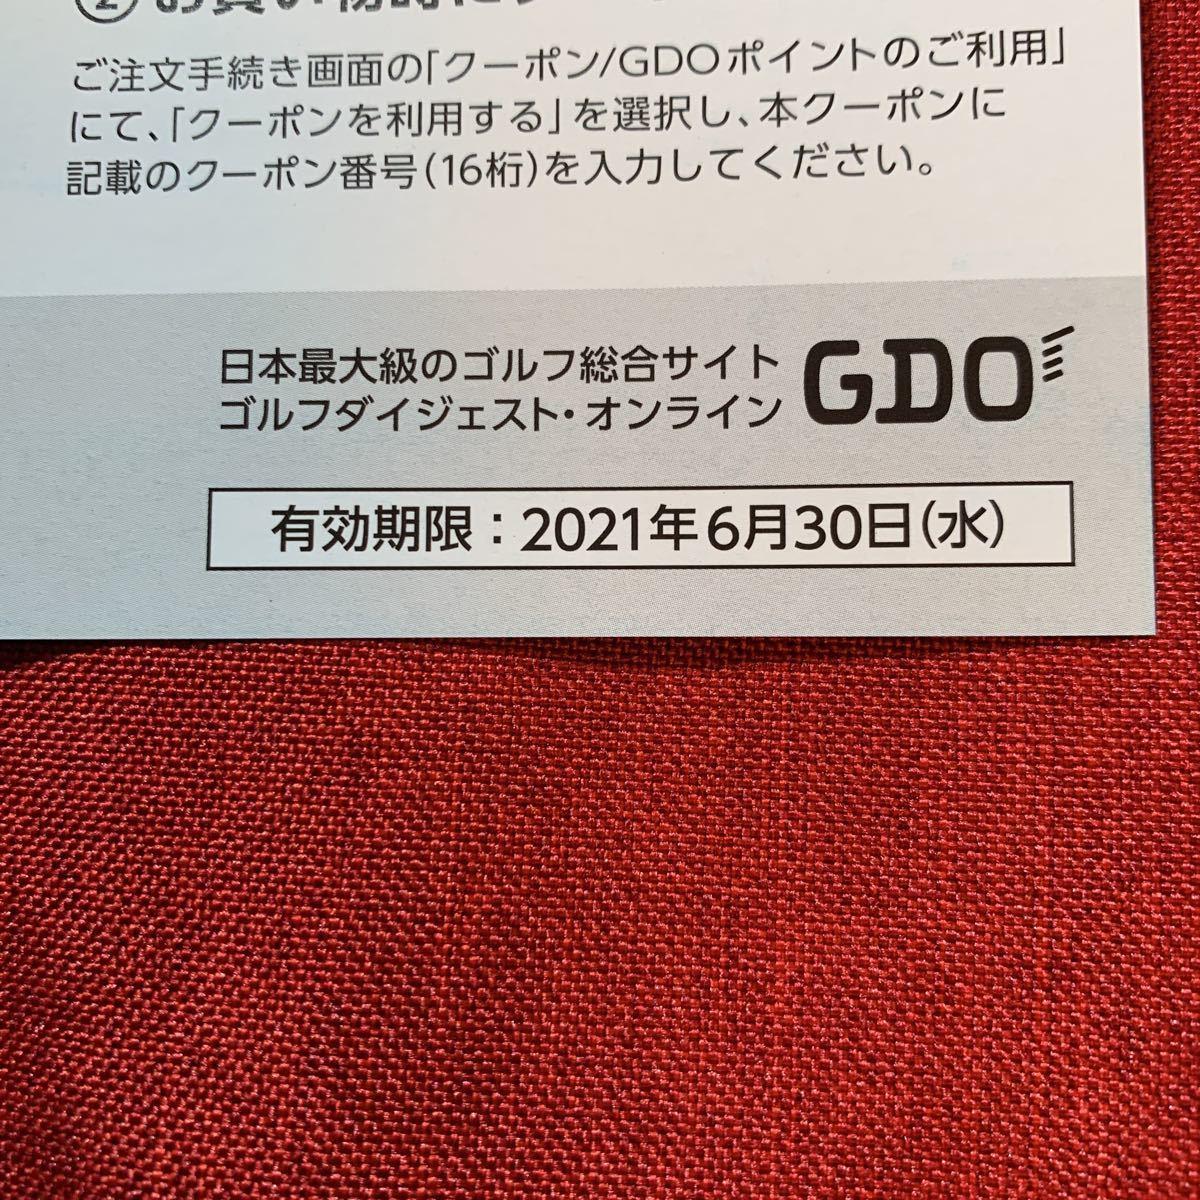 GDOゴルフダイジェストオンライン株主優待 GDOゴルフショップクーポン券3000円×1枚 20210630 番号通知可_画像2